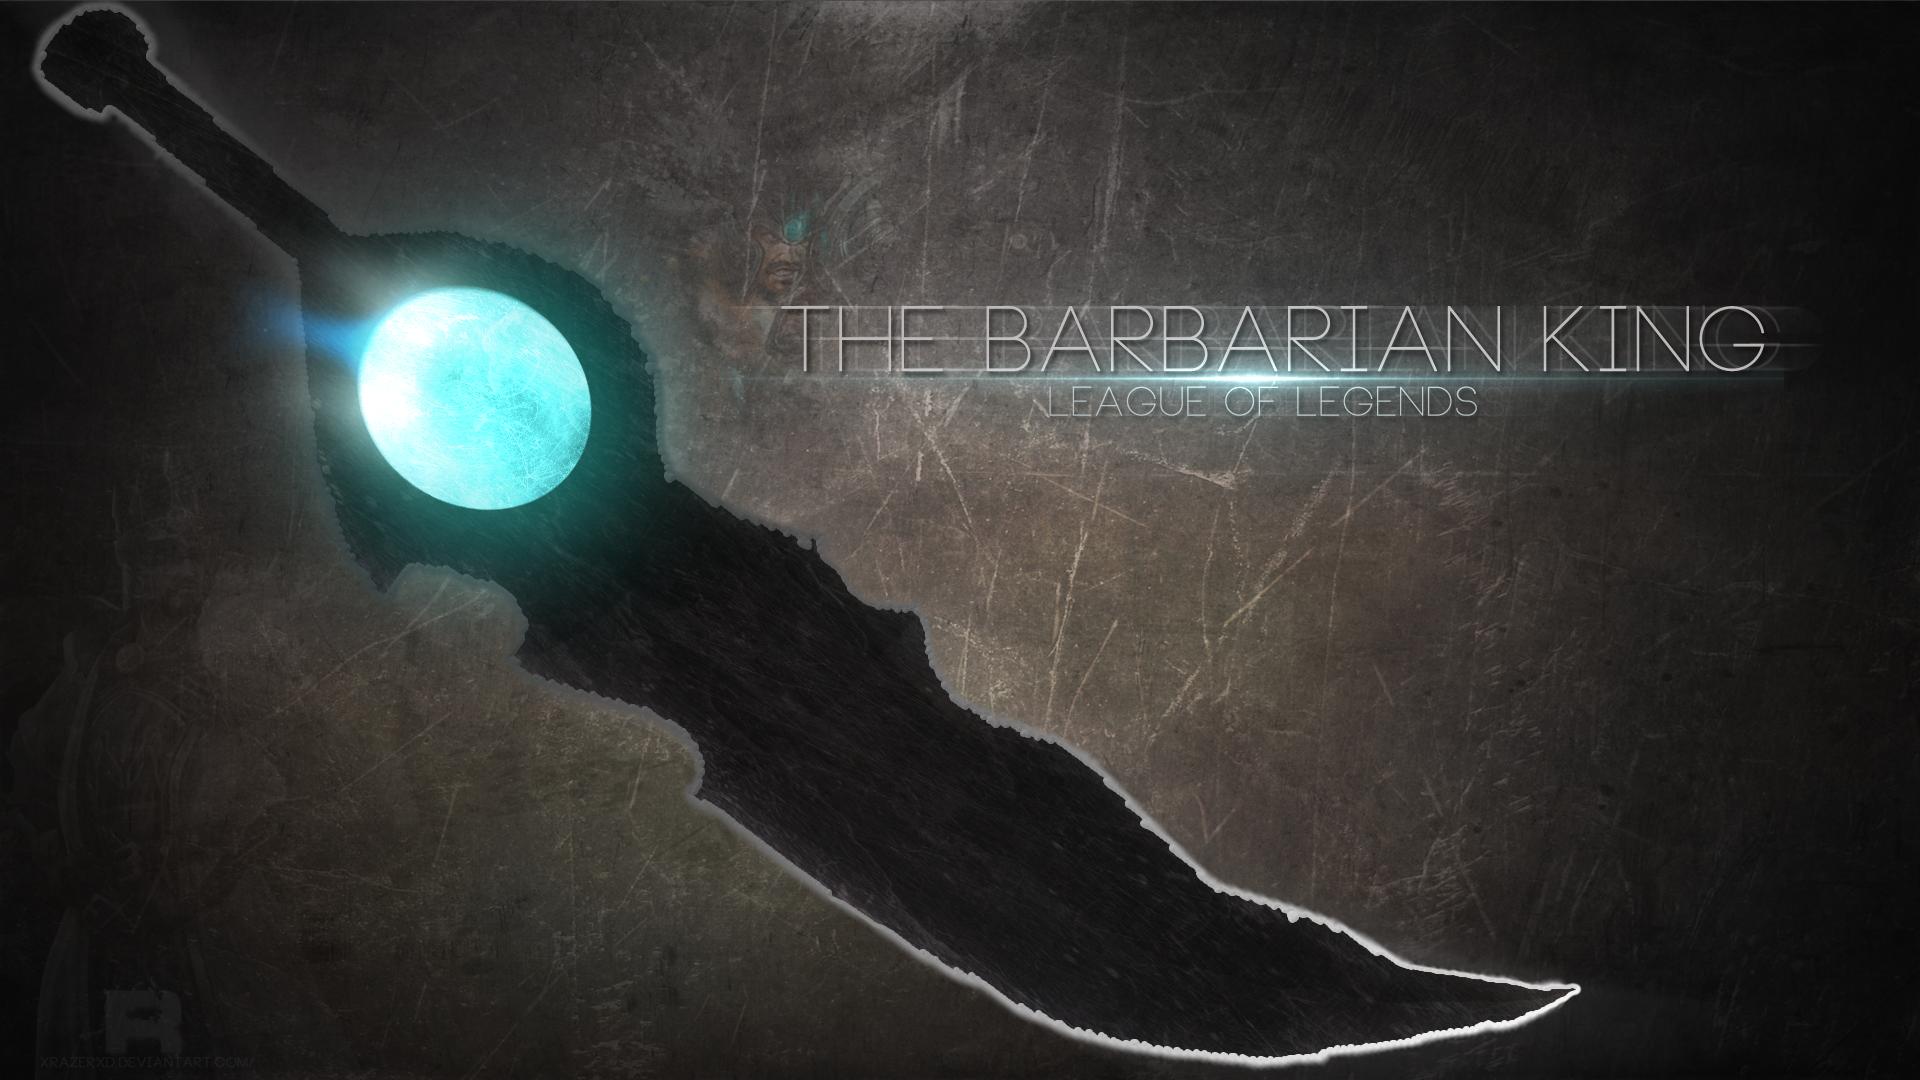 The Barbarian King wallpaper